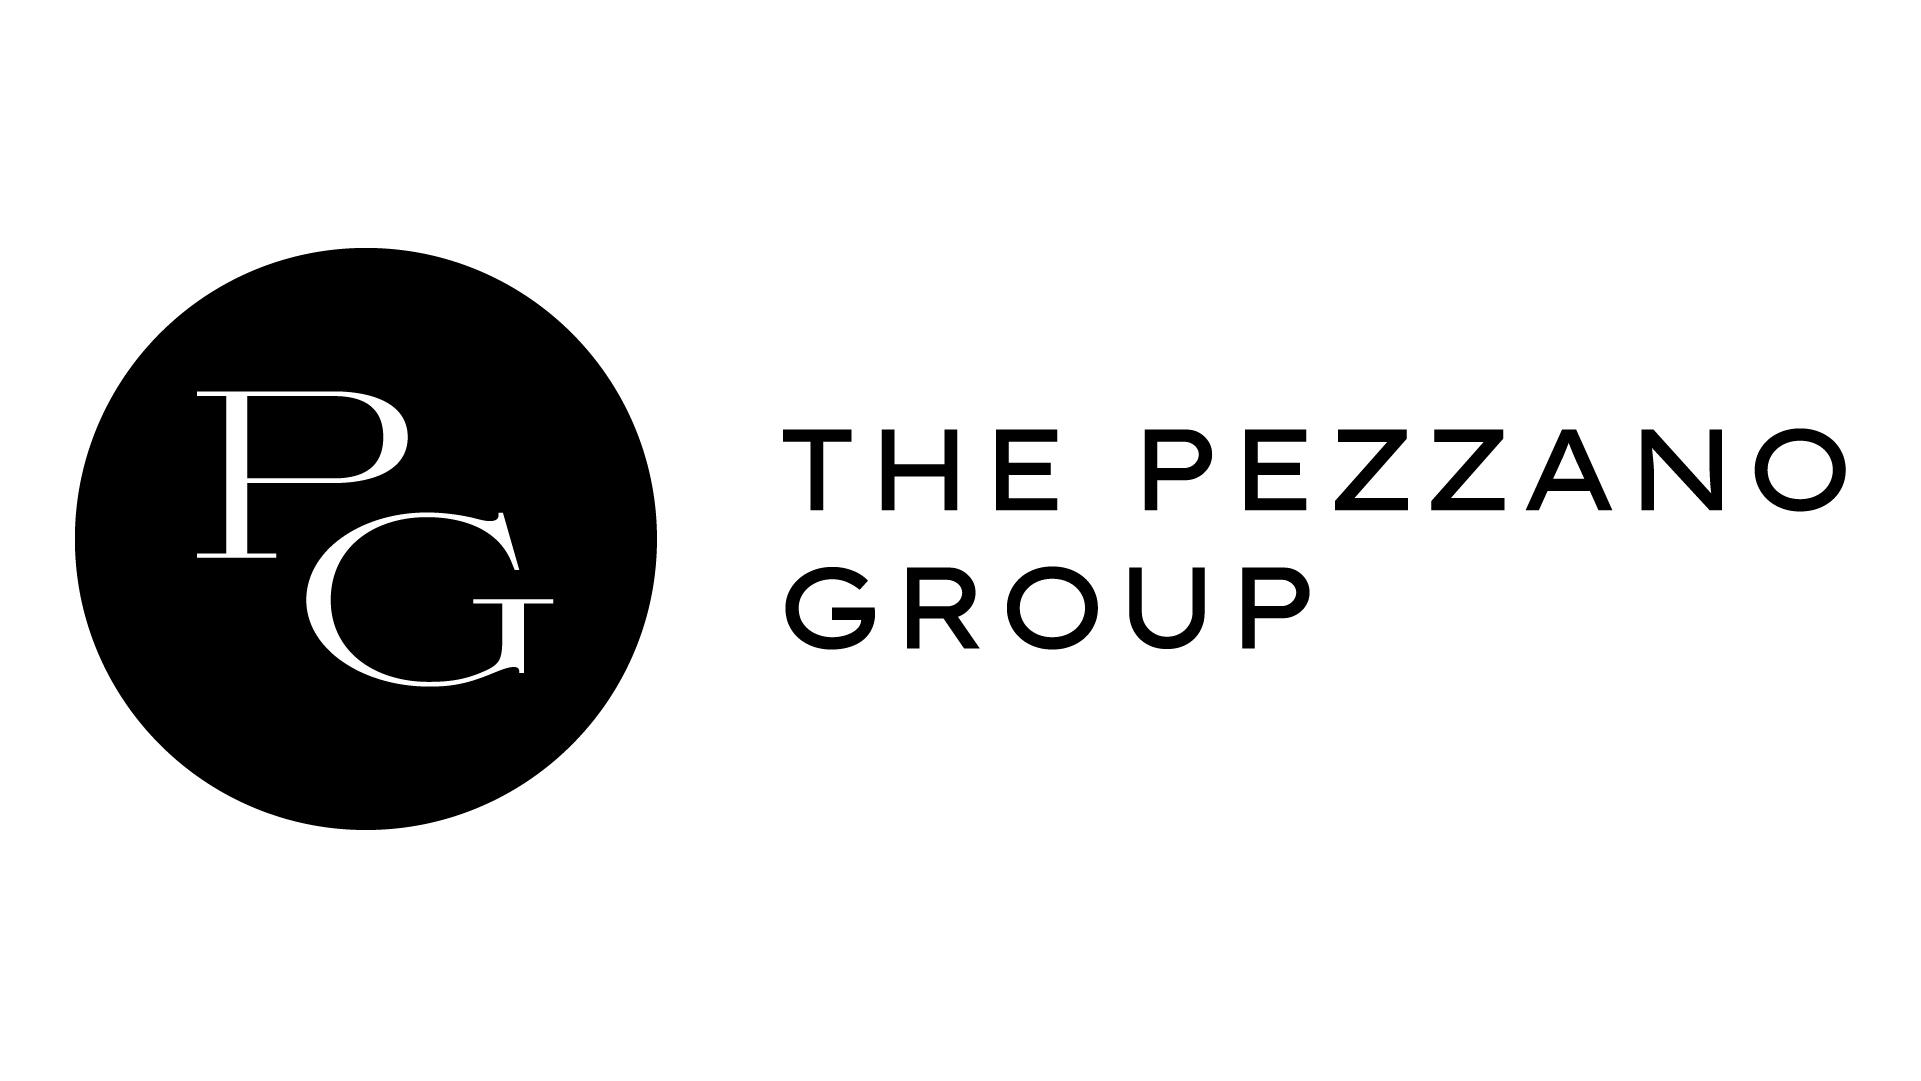 The Pezzano Group